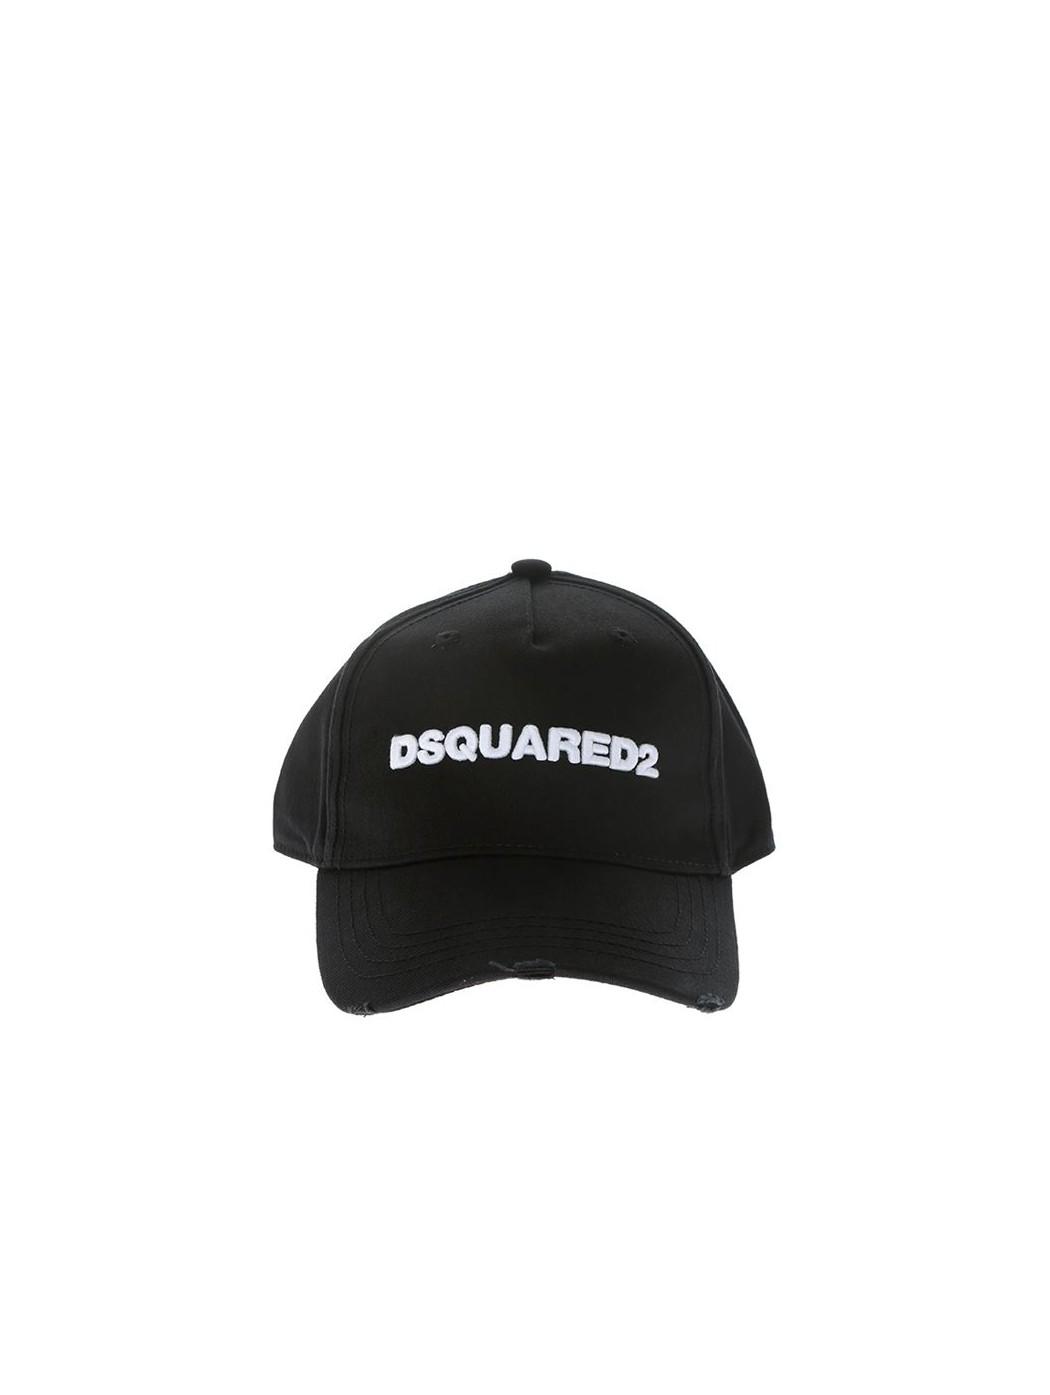 BASEBALL CAP DSQUARED2 BCM002805C00001 M063